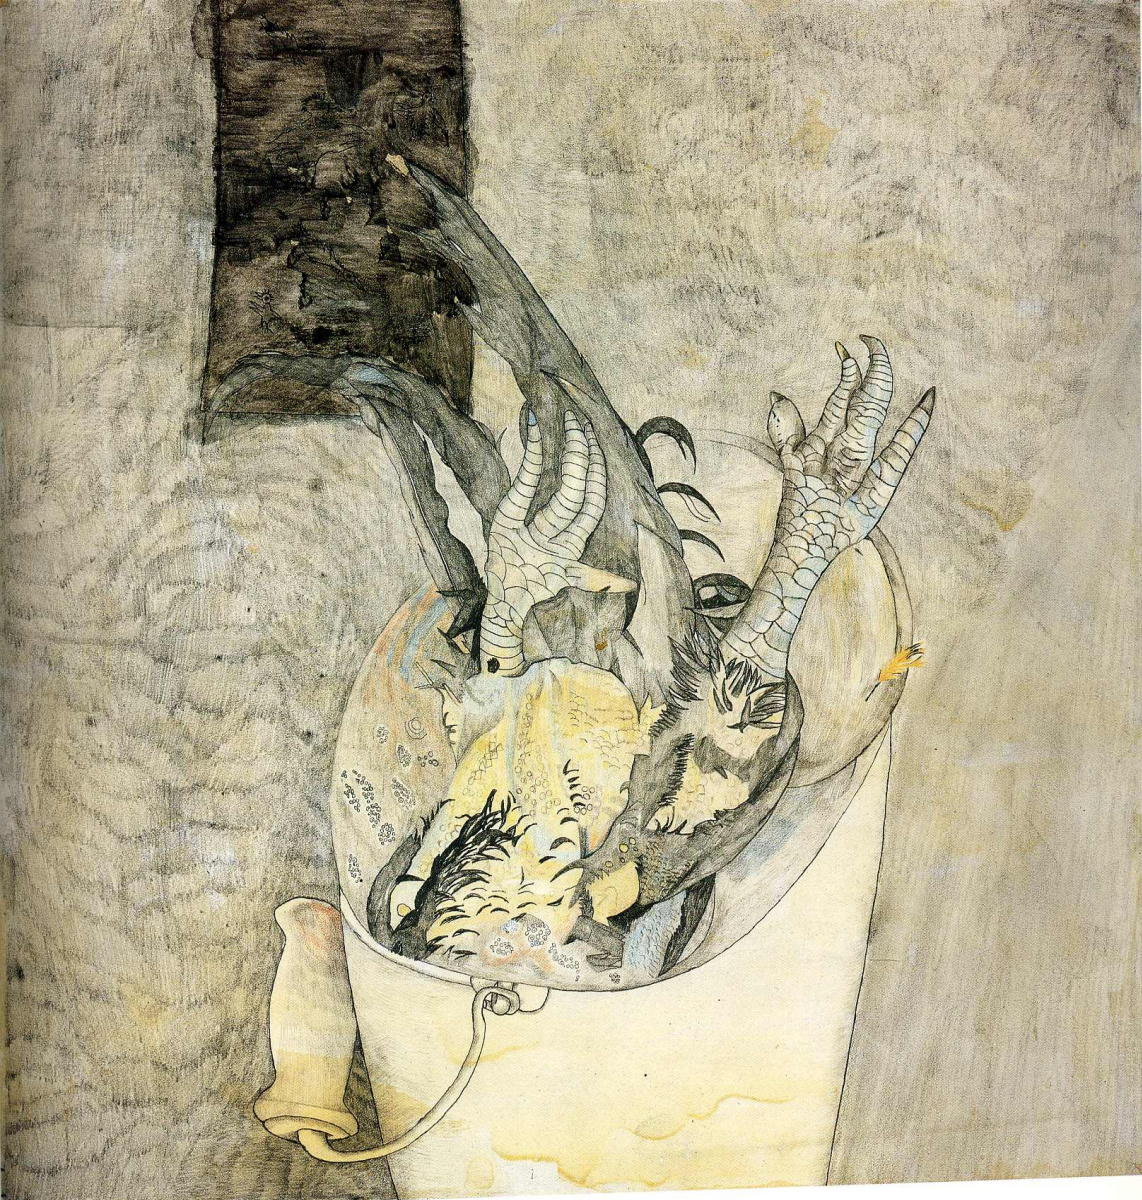 Lucien Freud. Untitled